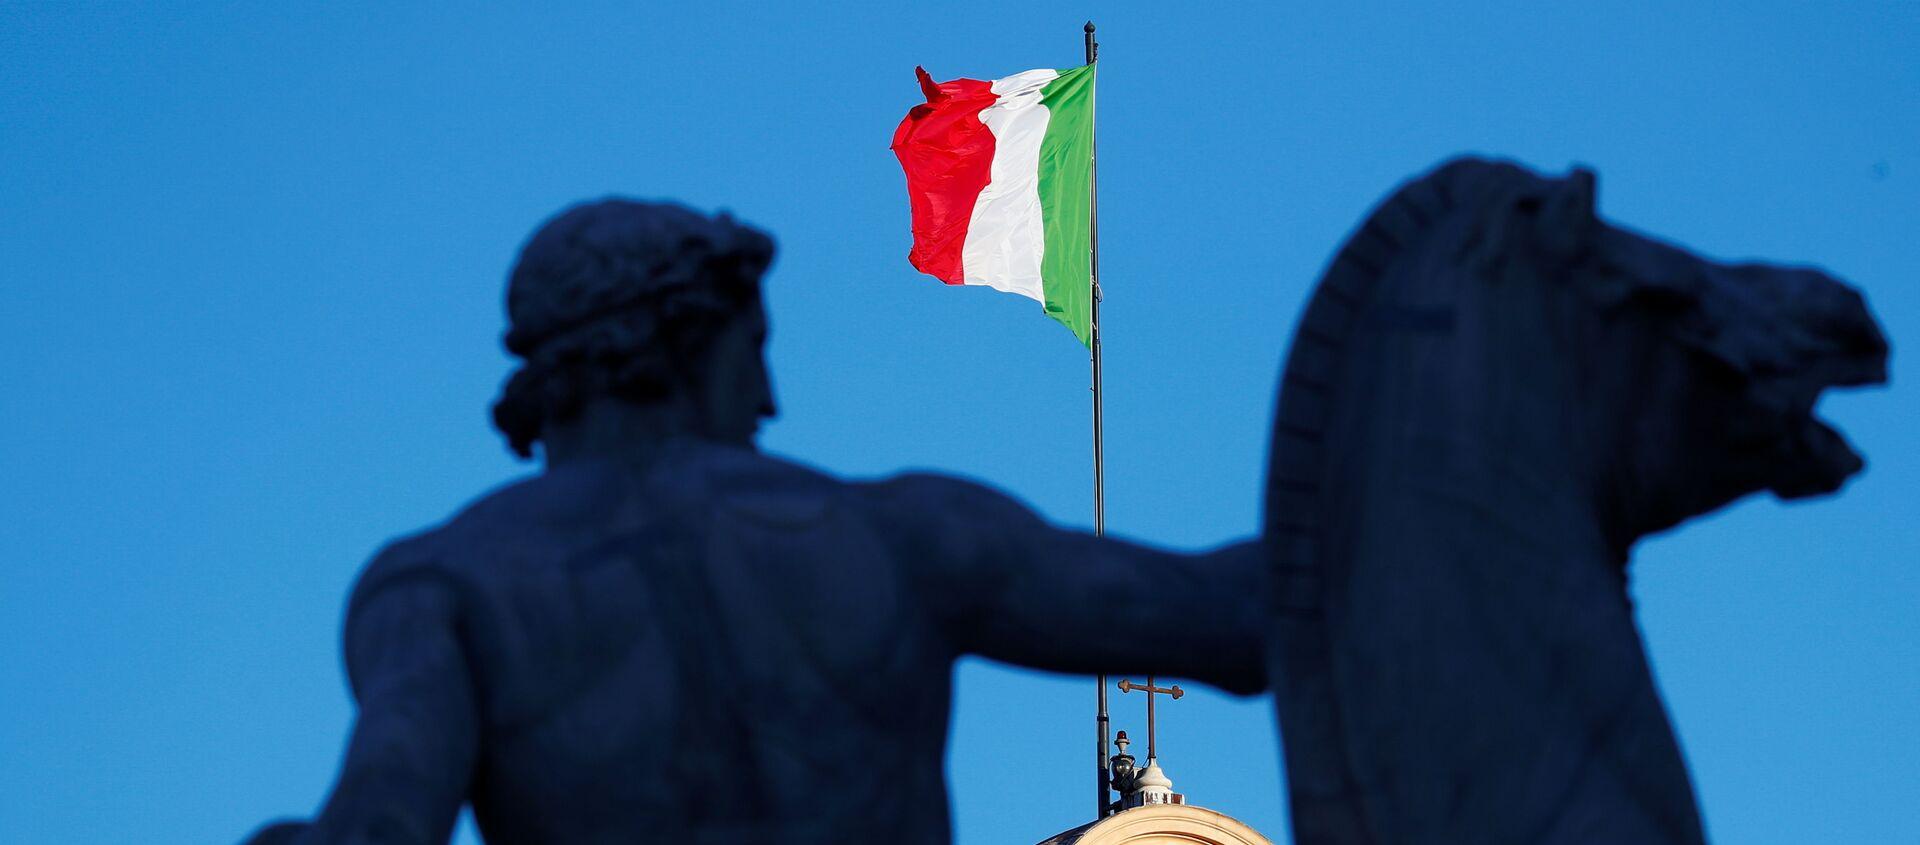 Bandera de Italia - Sputnik Mundo, 1920, 28.01.2021